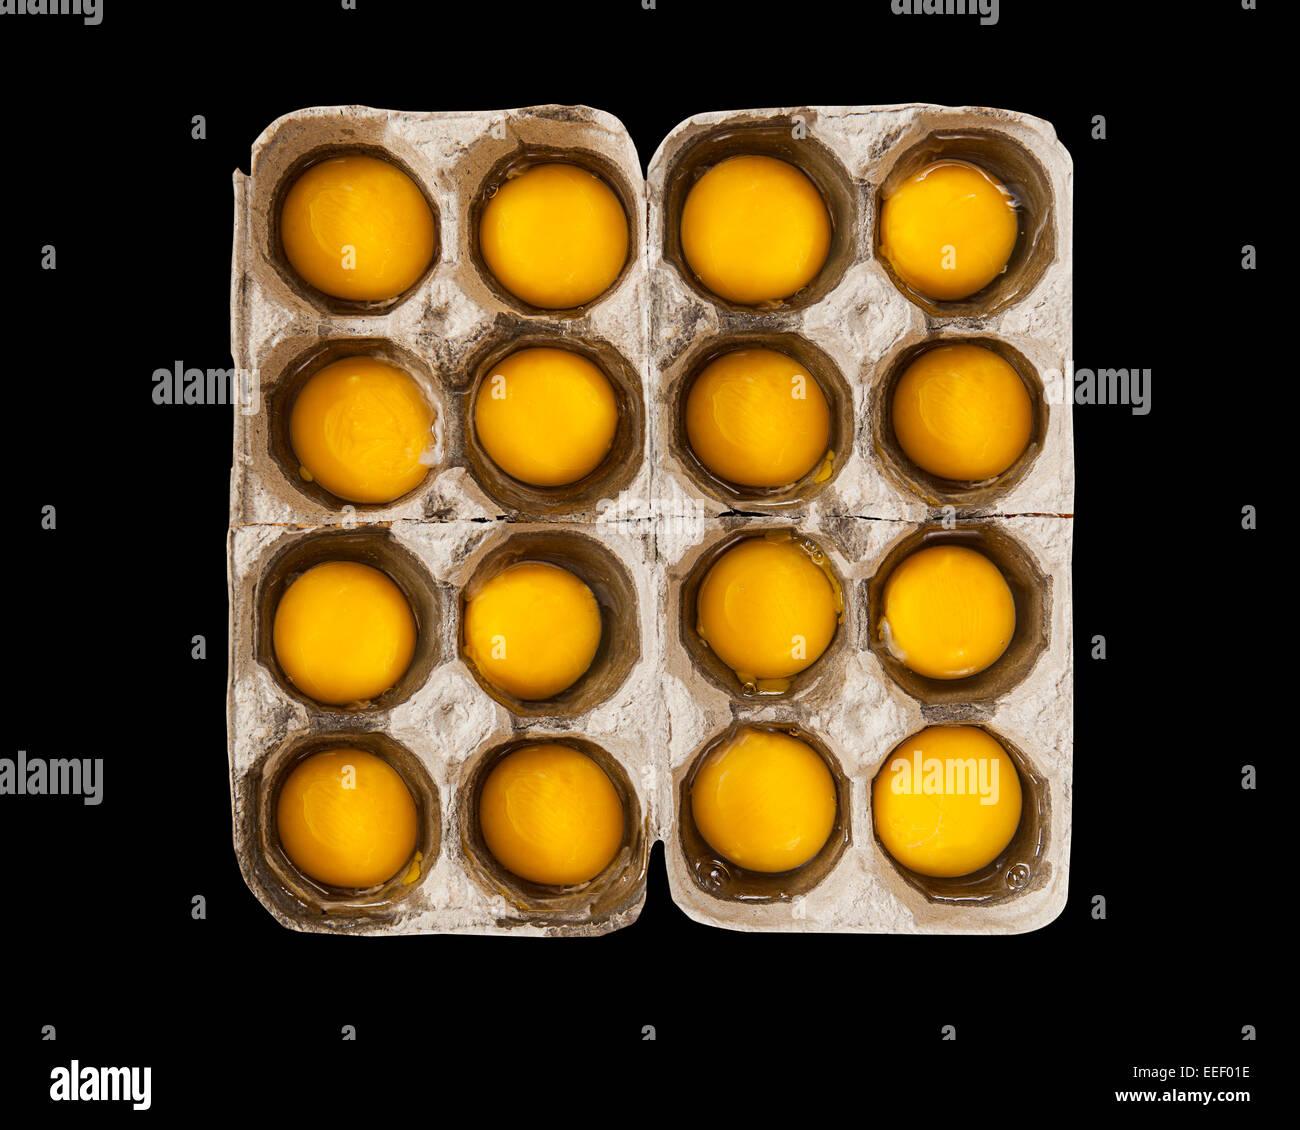 Yolk,yolks,yoke,egg,eggs - Stock Image